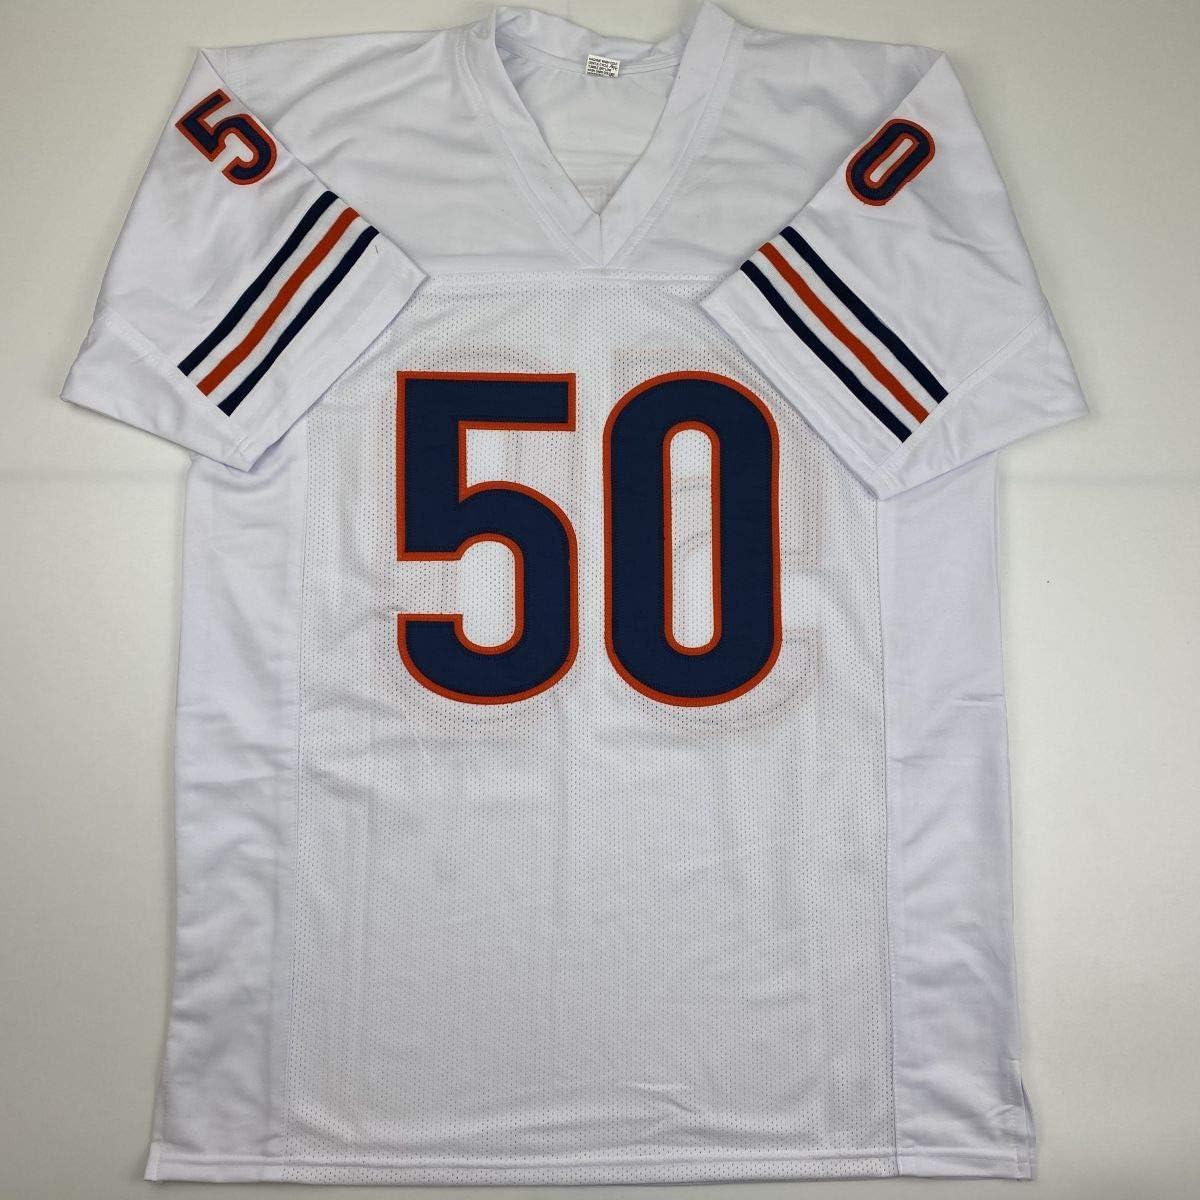 Autographed//Signed Mike Singletary HOF 98 Chicago White Football Jersey JSA COA